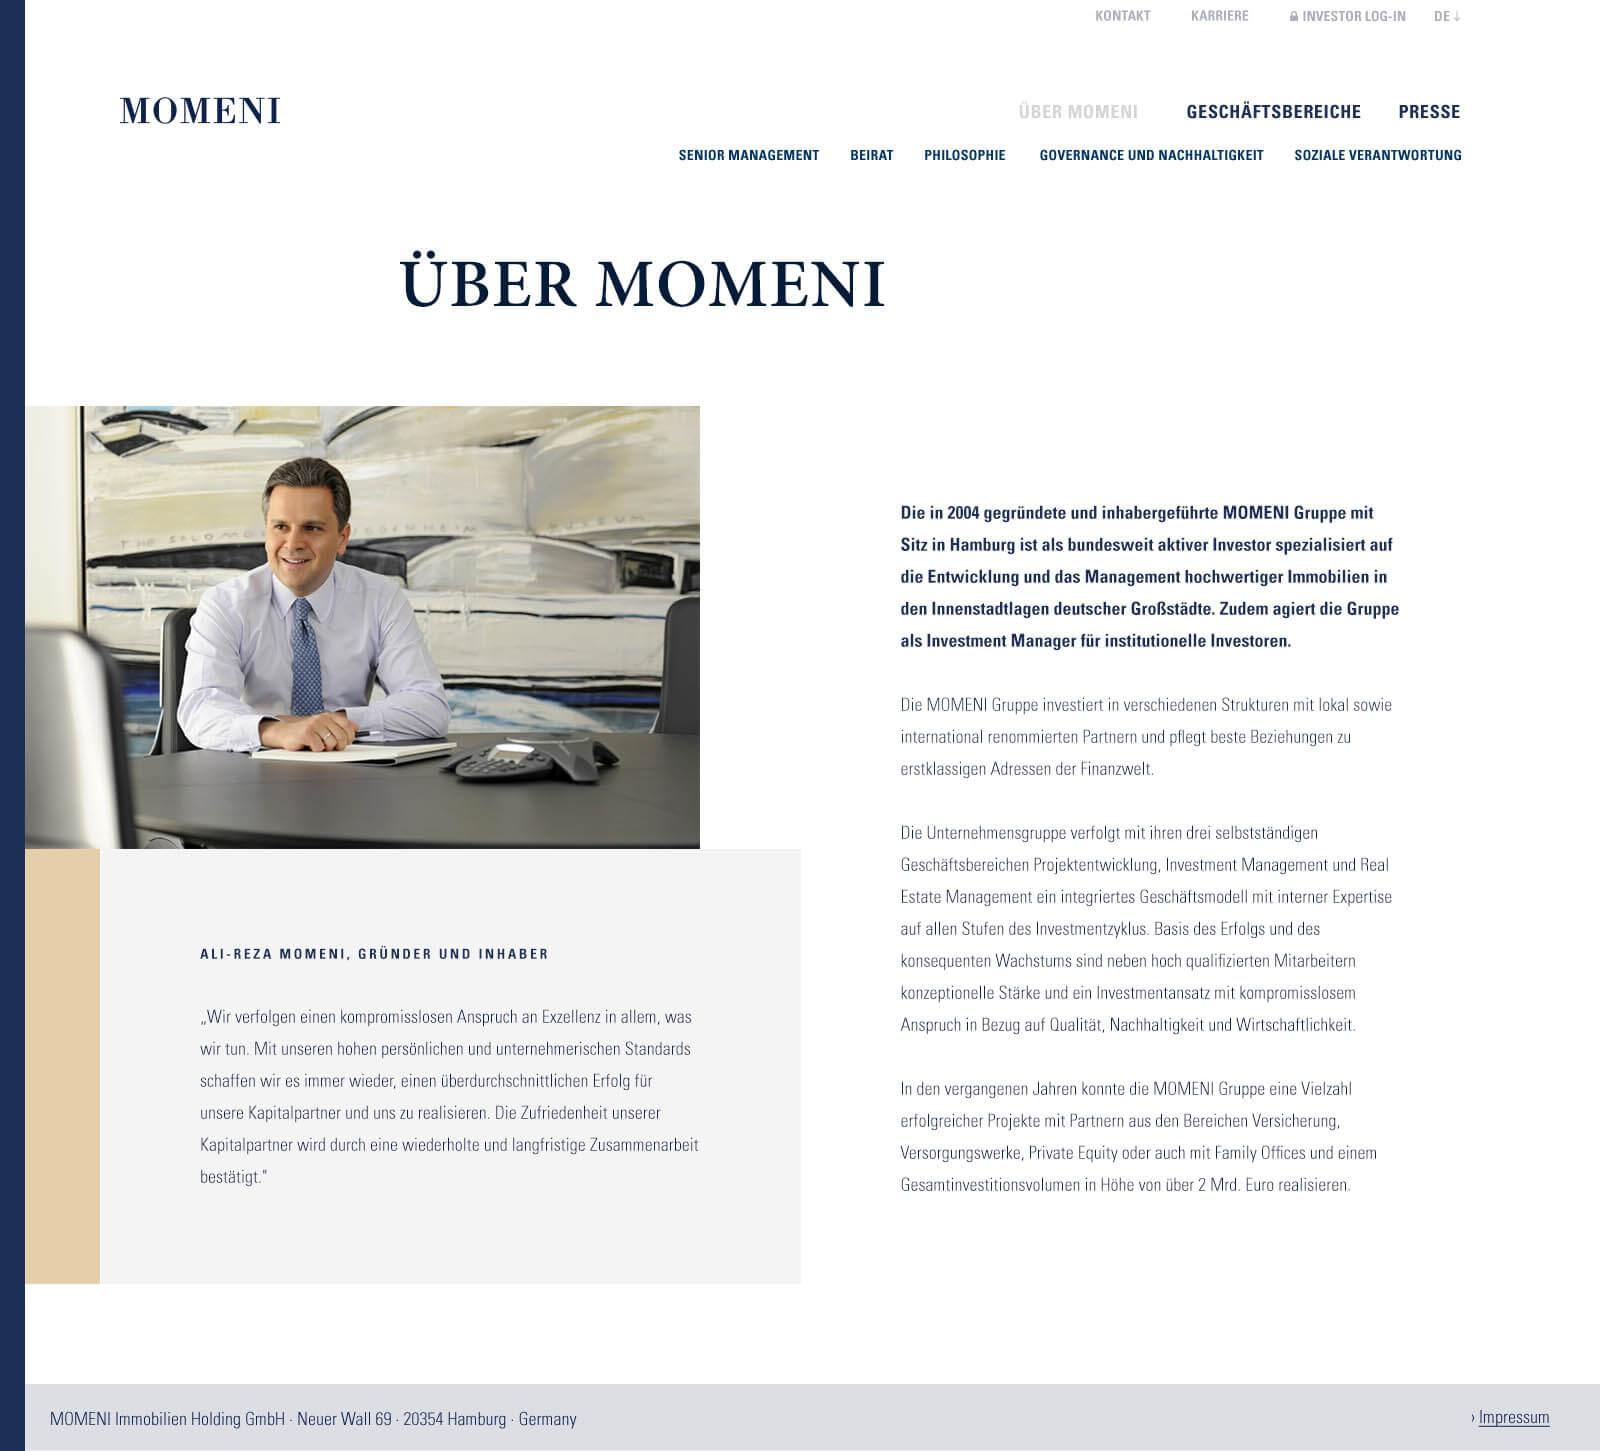 Immobilien Website in Düsseldorf: Projektentwickler Momeni Group - Geschäftsführung